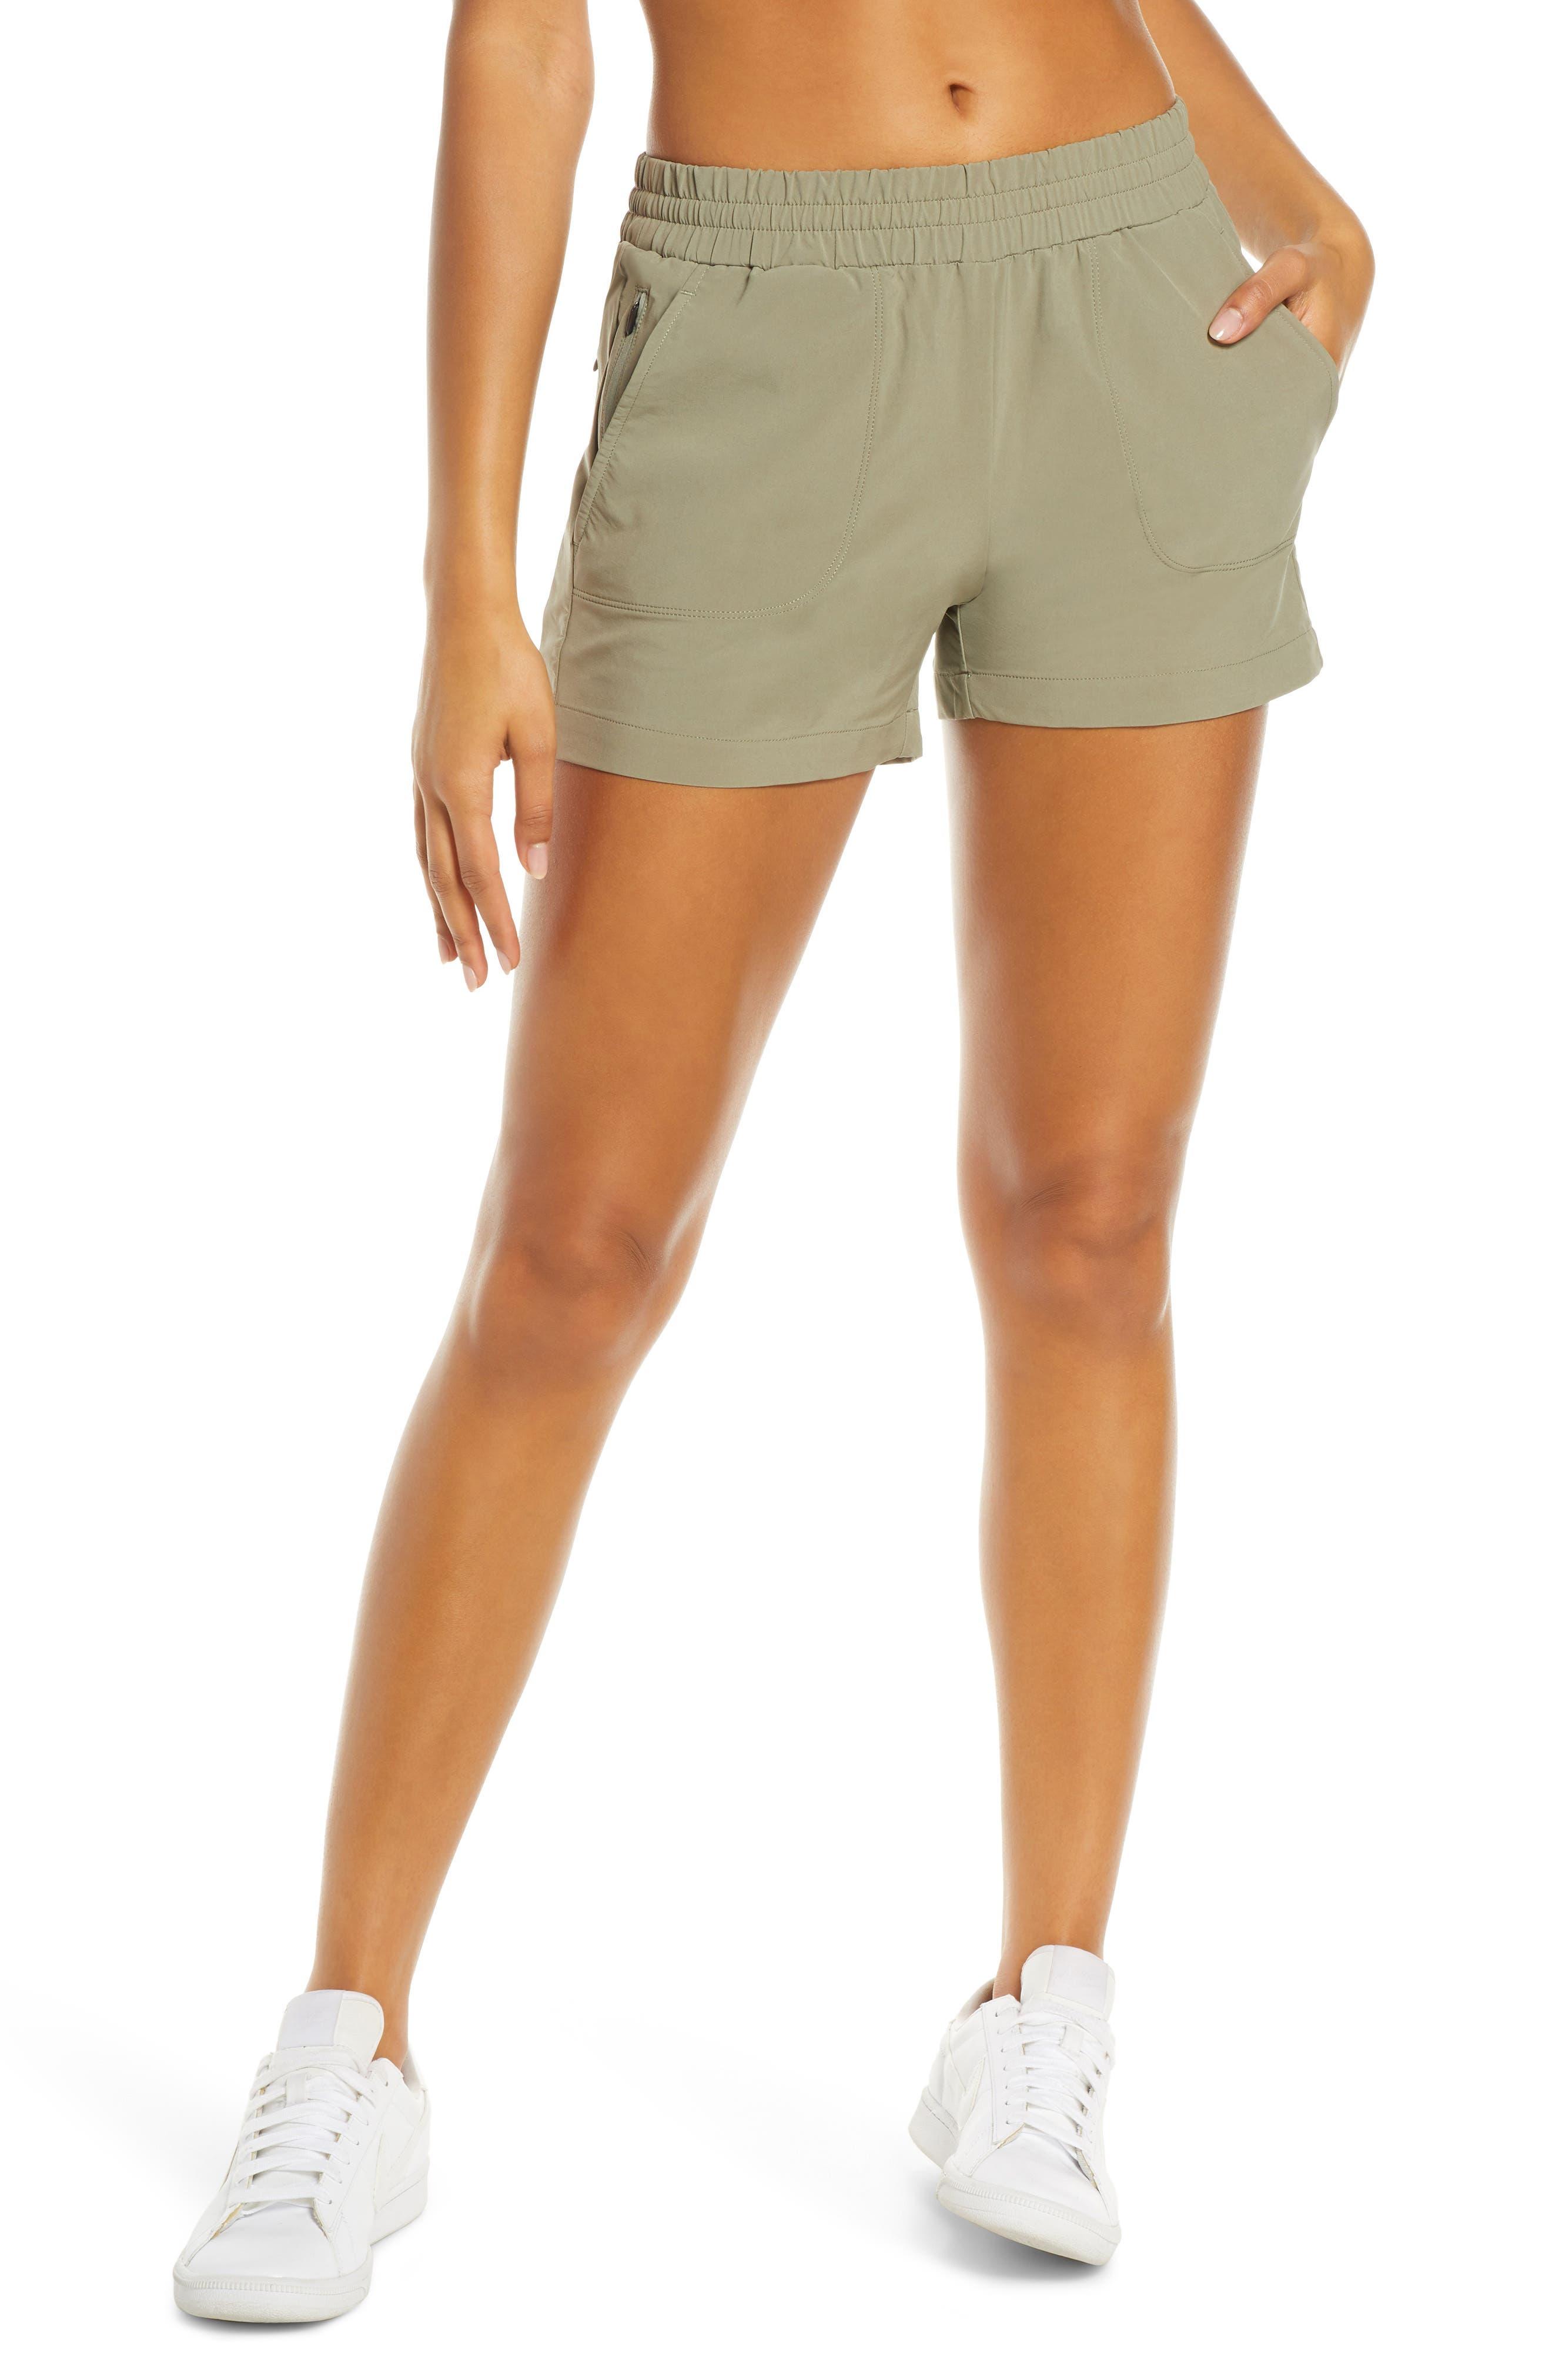 Zella Community Canyon Shorts